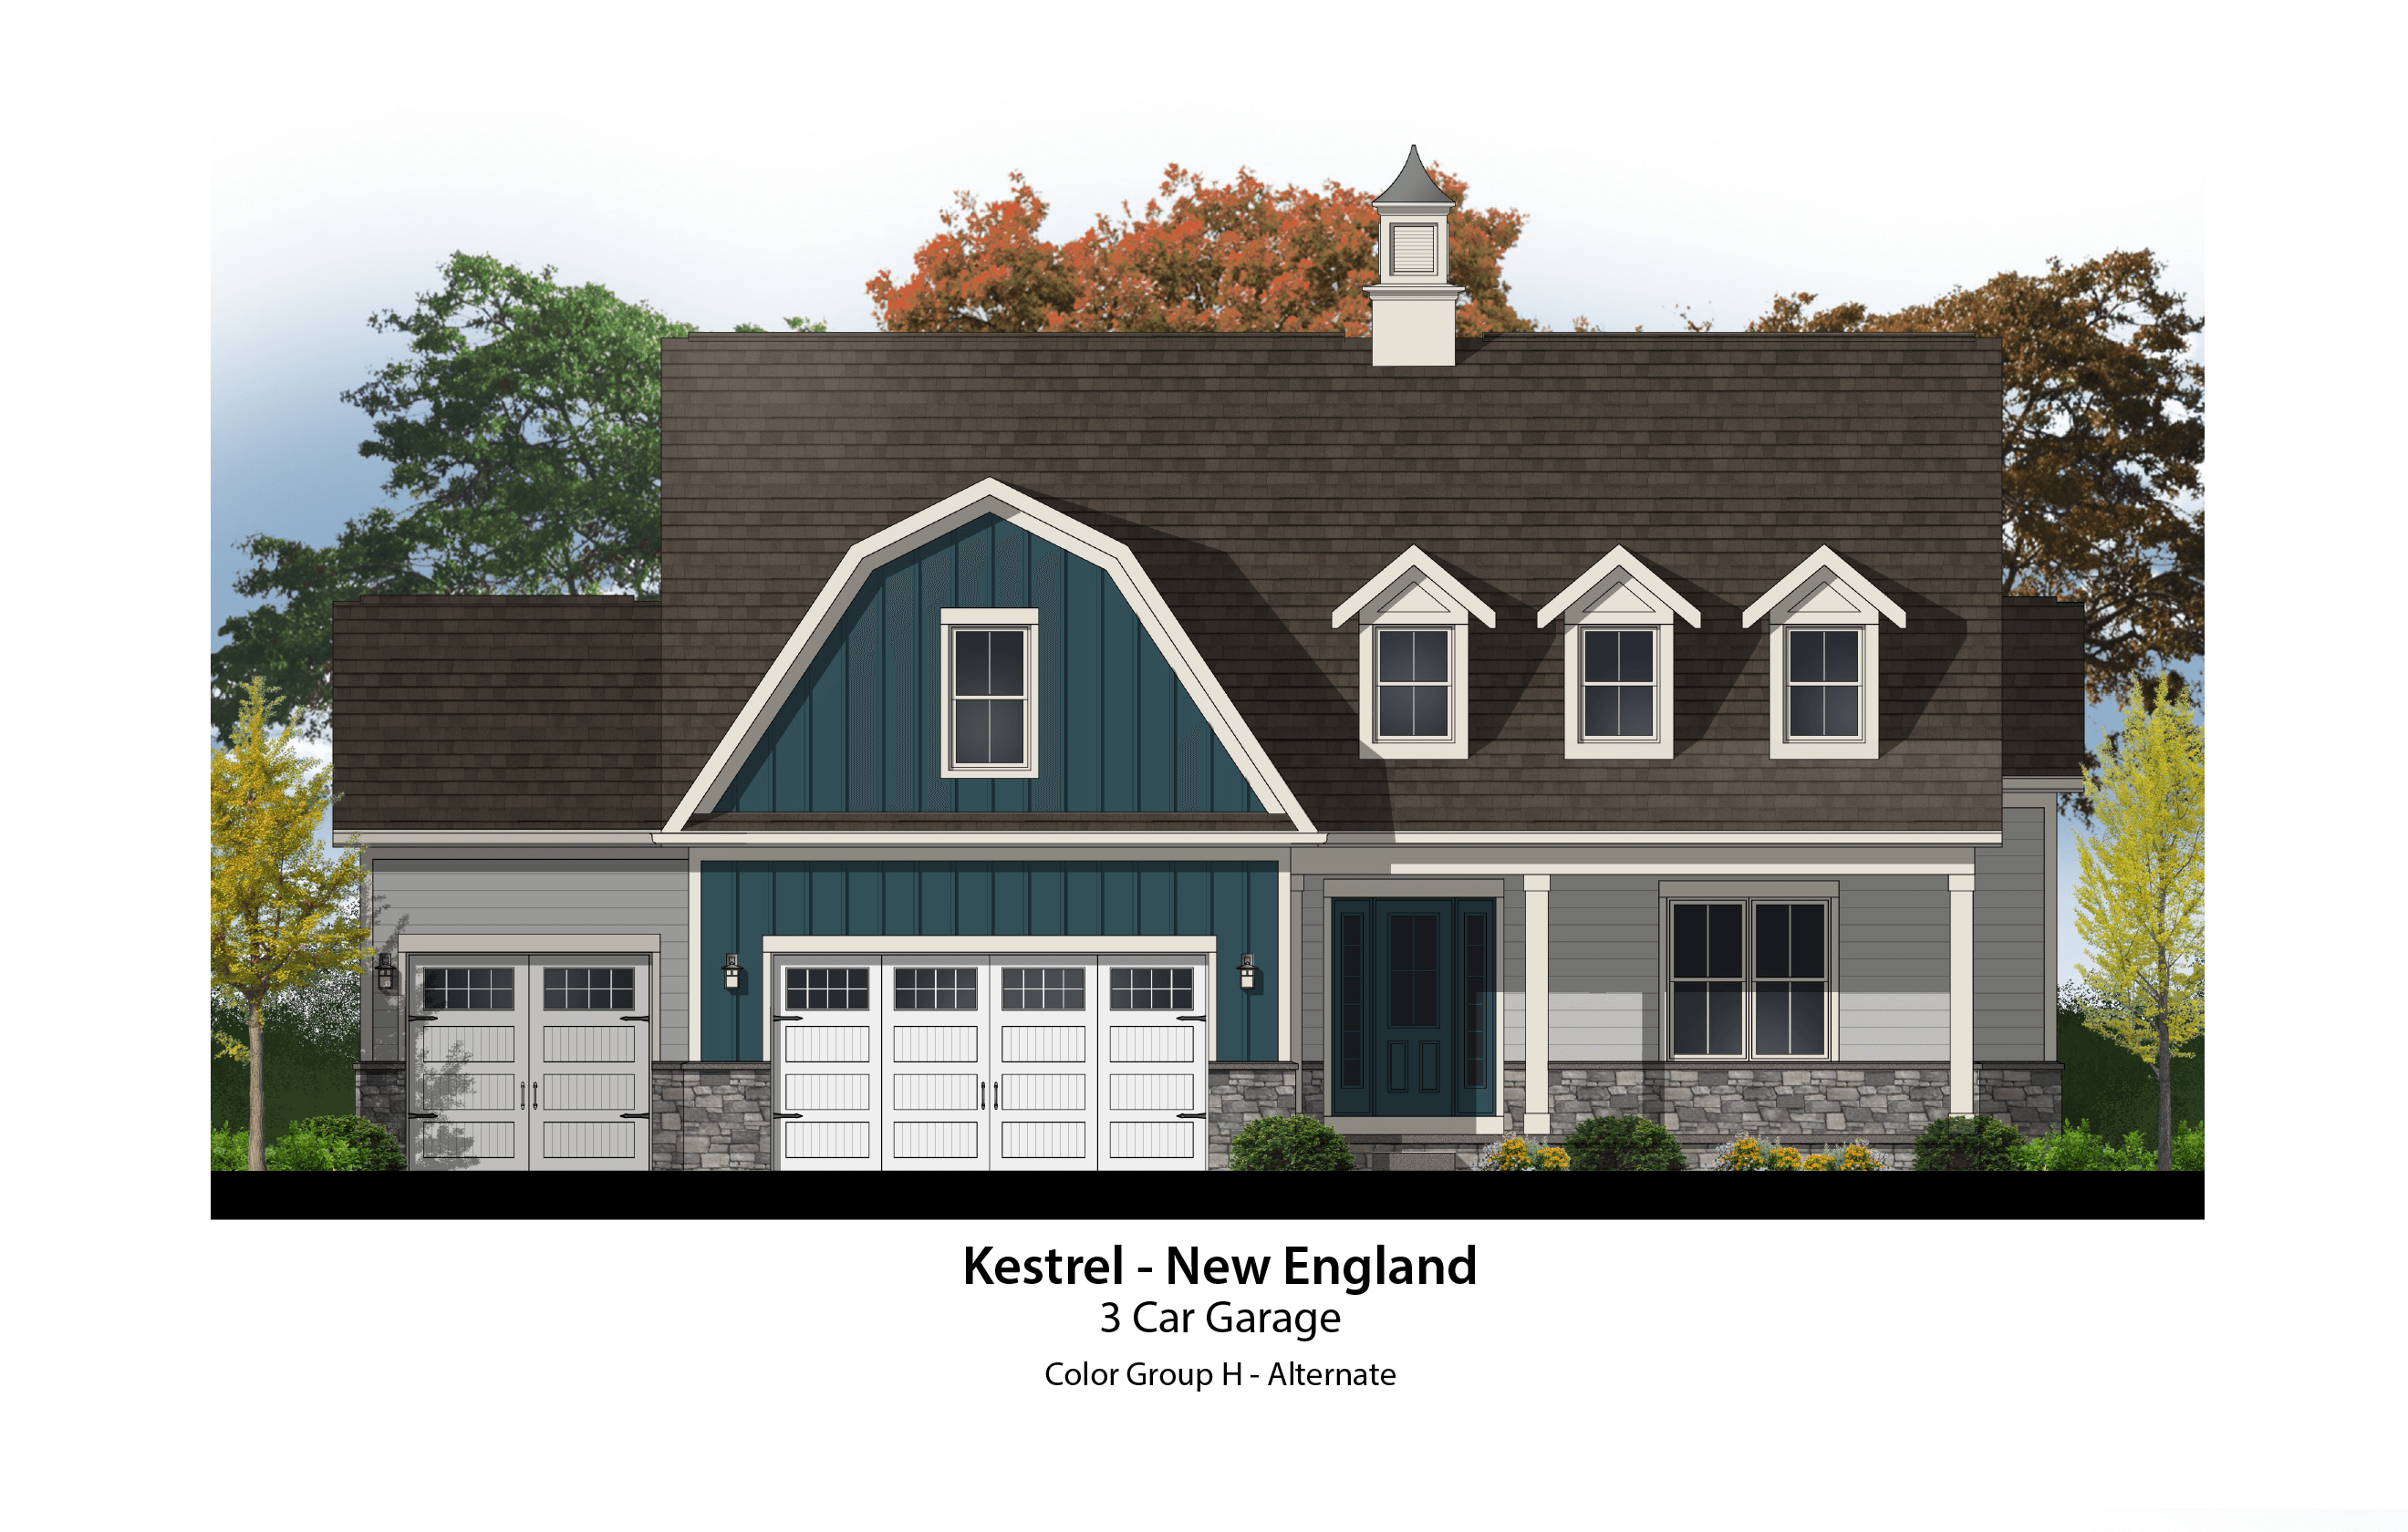 Kestrel New England 3 Car CG H ALTERNATE